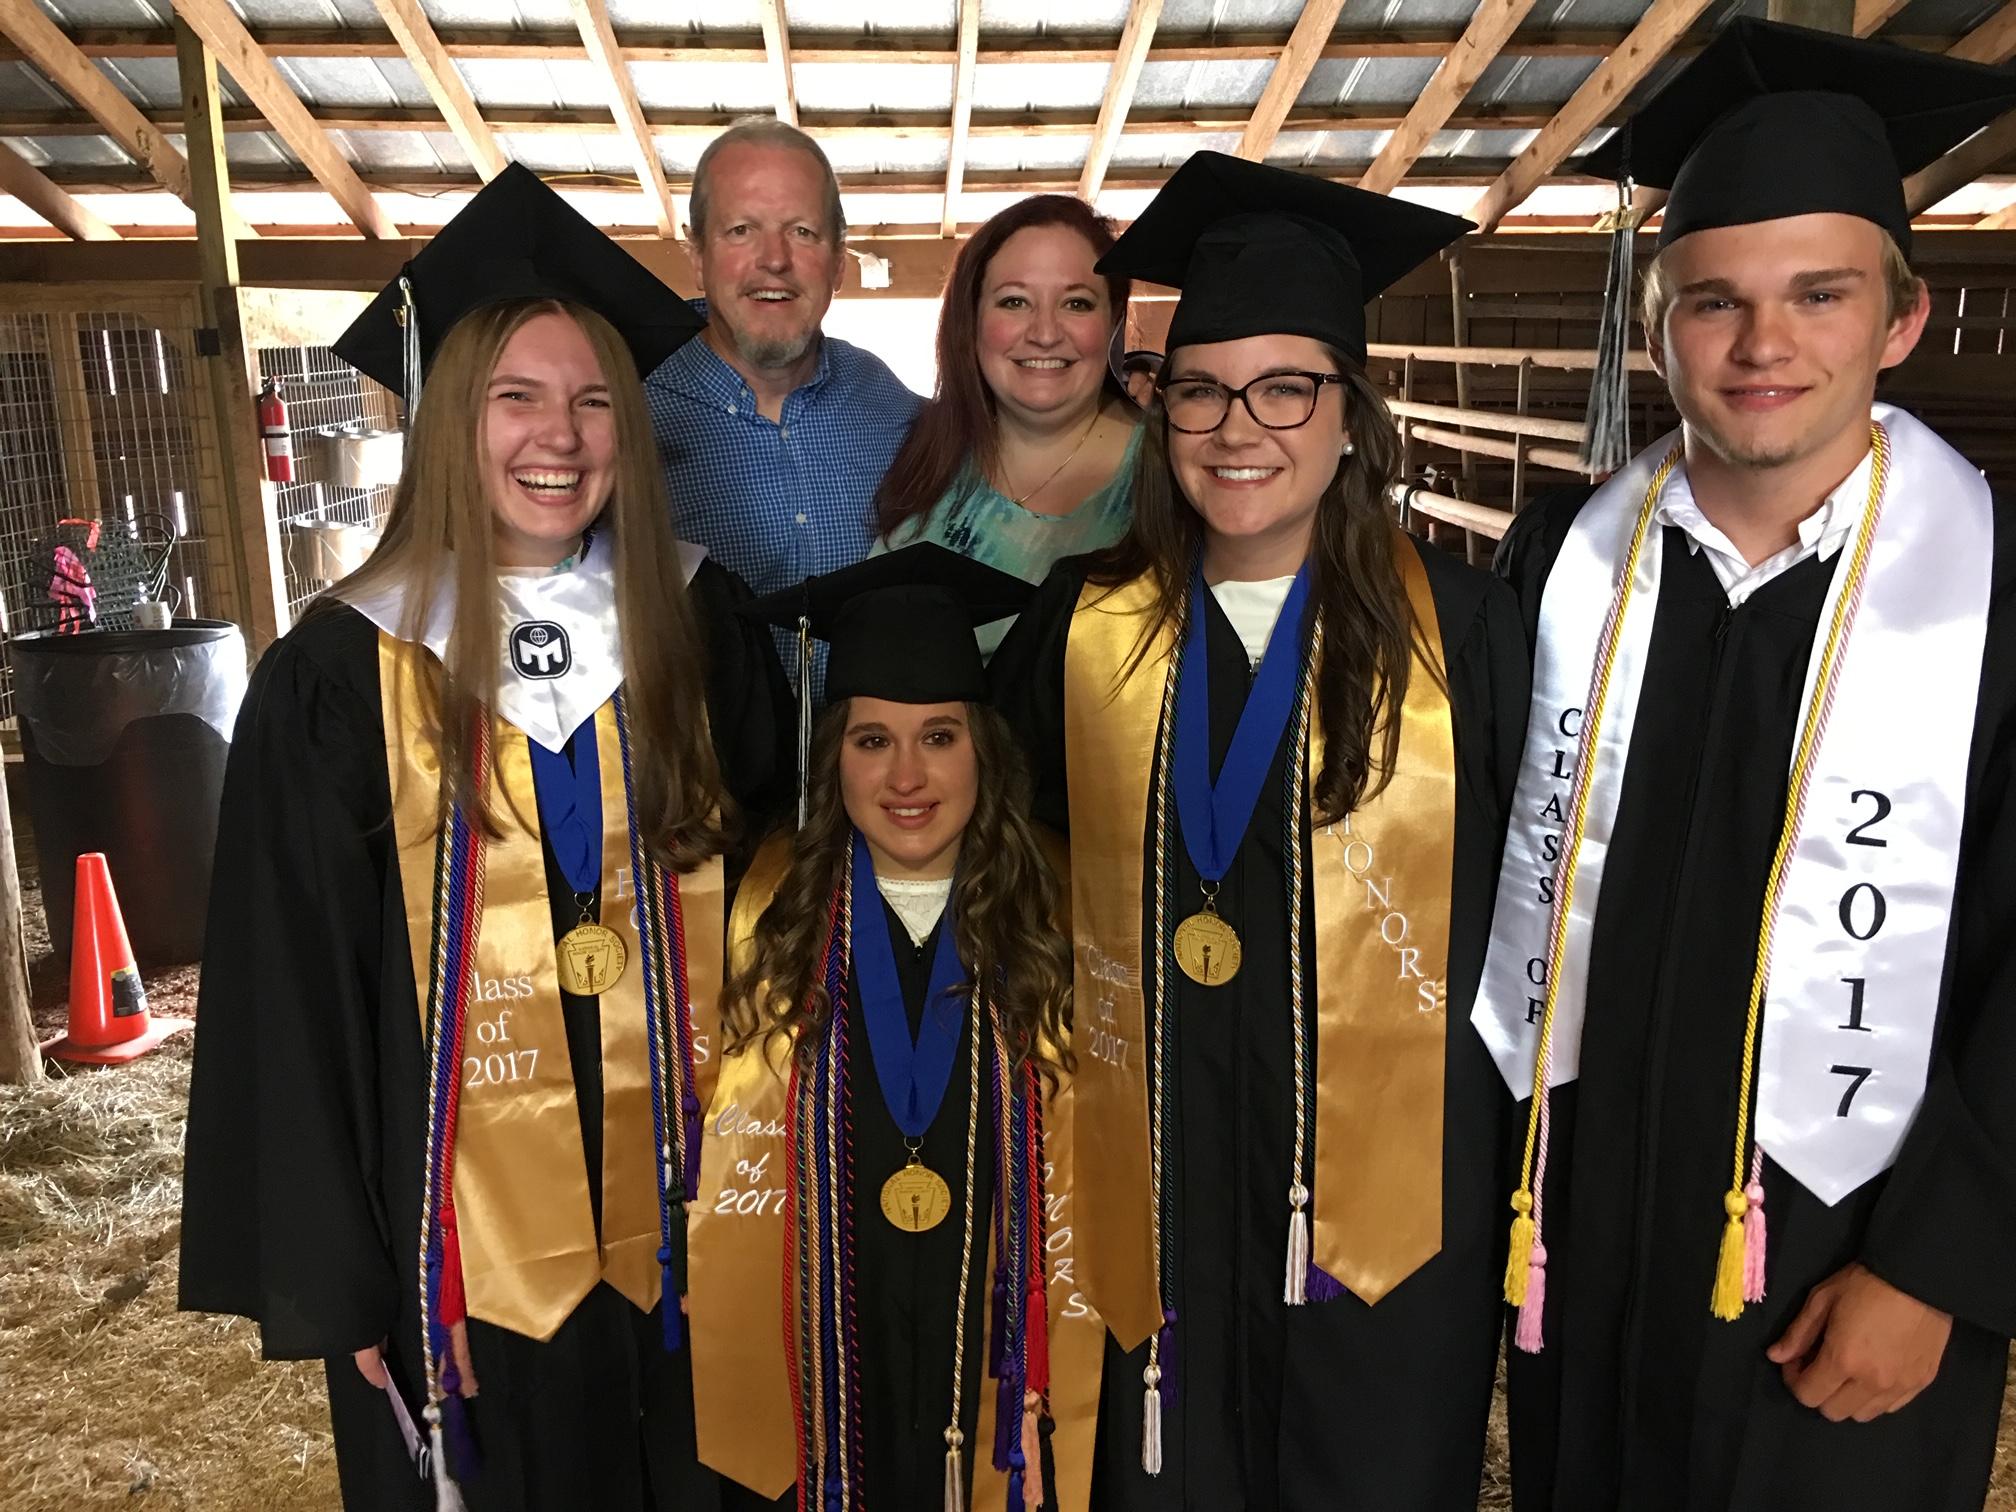 2017 First graduating class from MLA